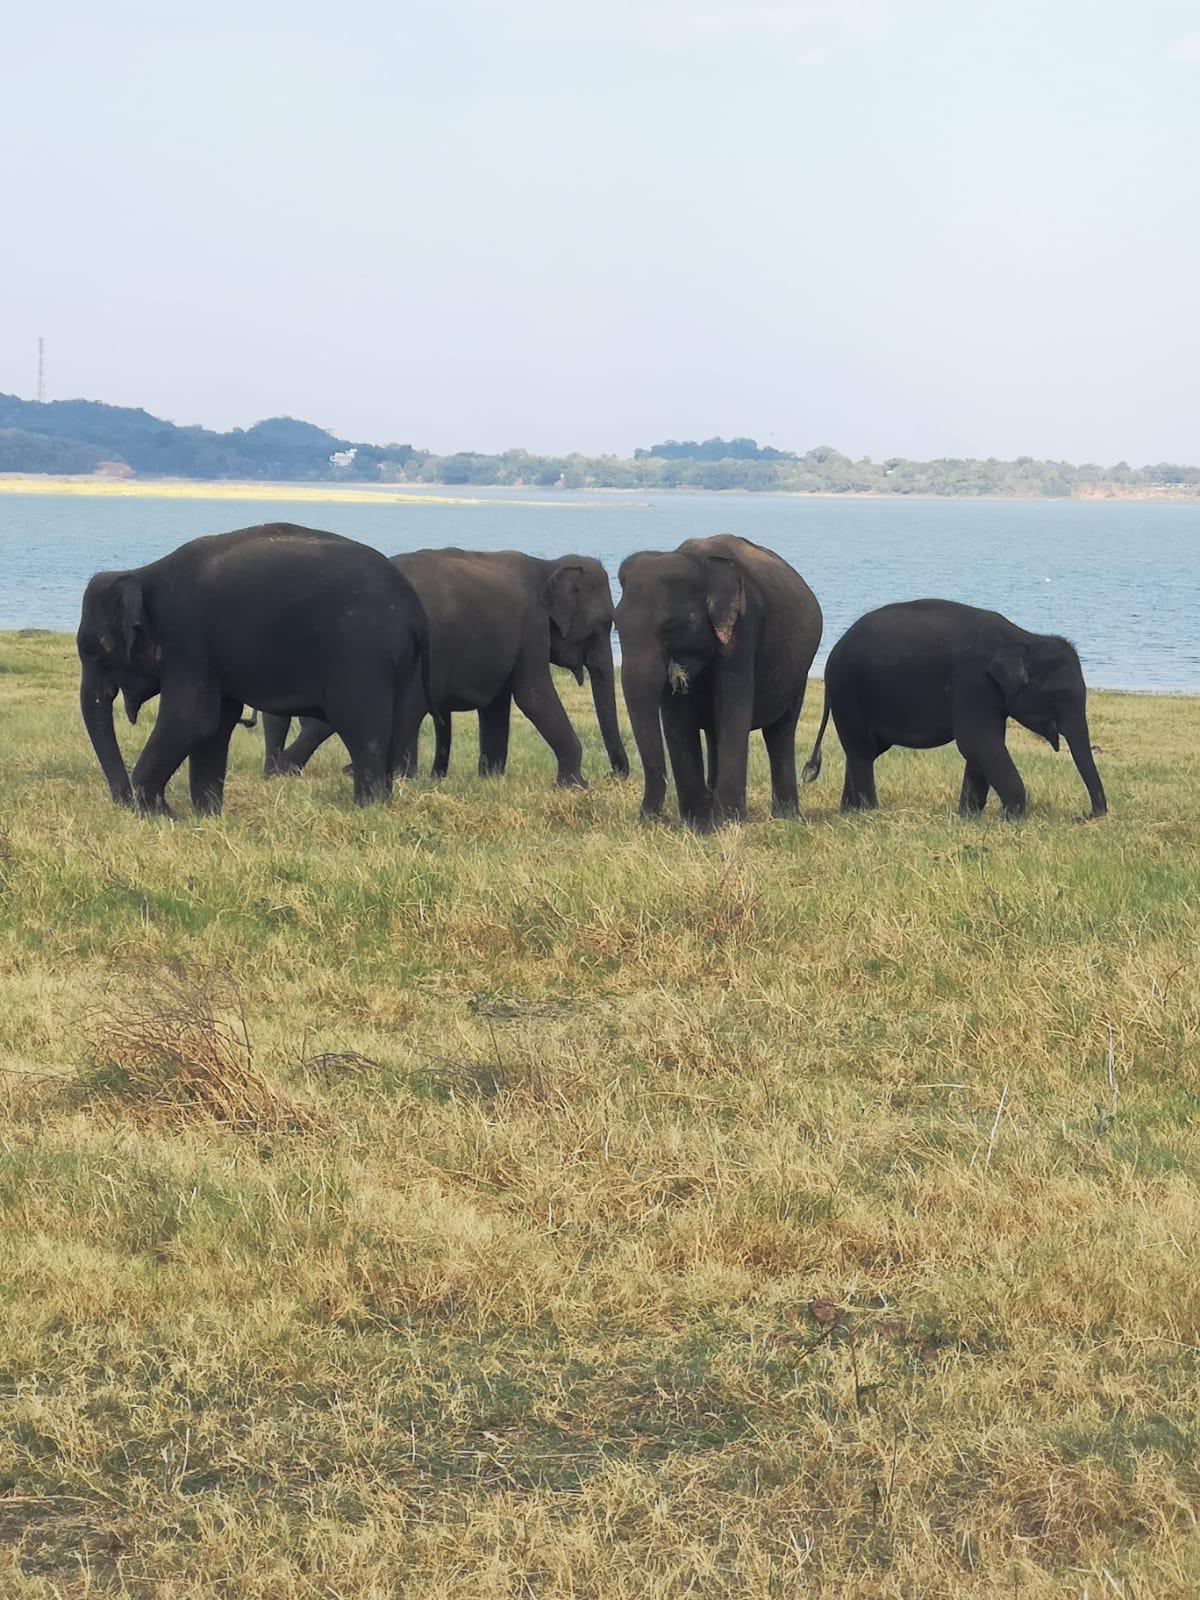 invite-to-paradise-sri-lanka-holiday-honeymoon-specialists-customer-feedback-elin-jordan-luce-wildife-safari-elephant.JPG